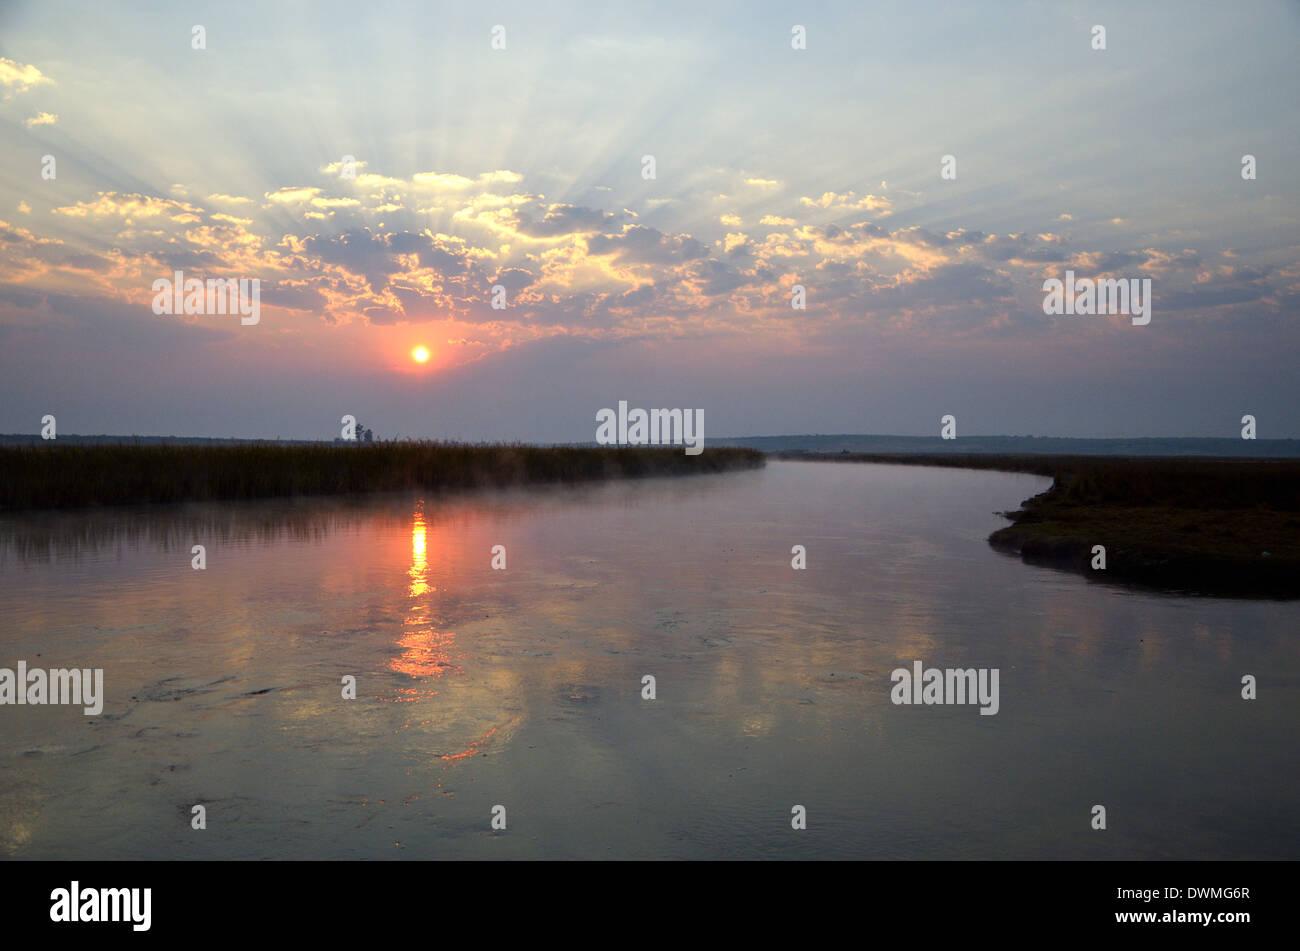 Sunrise over River, Cuito Cuanavale. Angola. Stock Photo